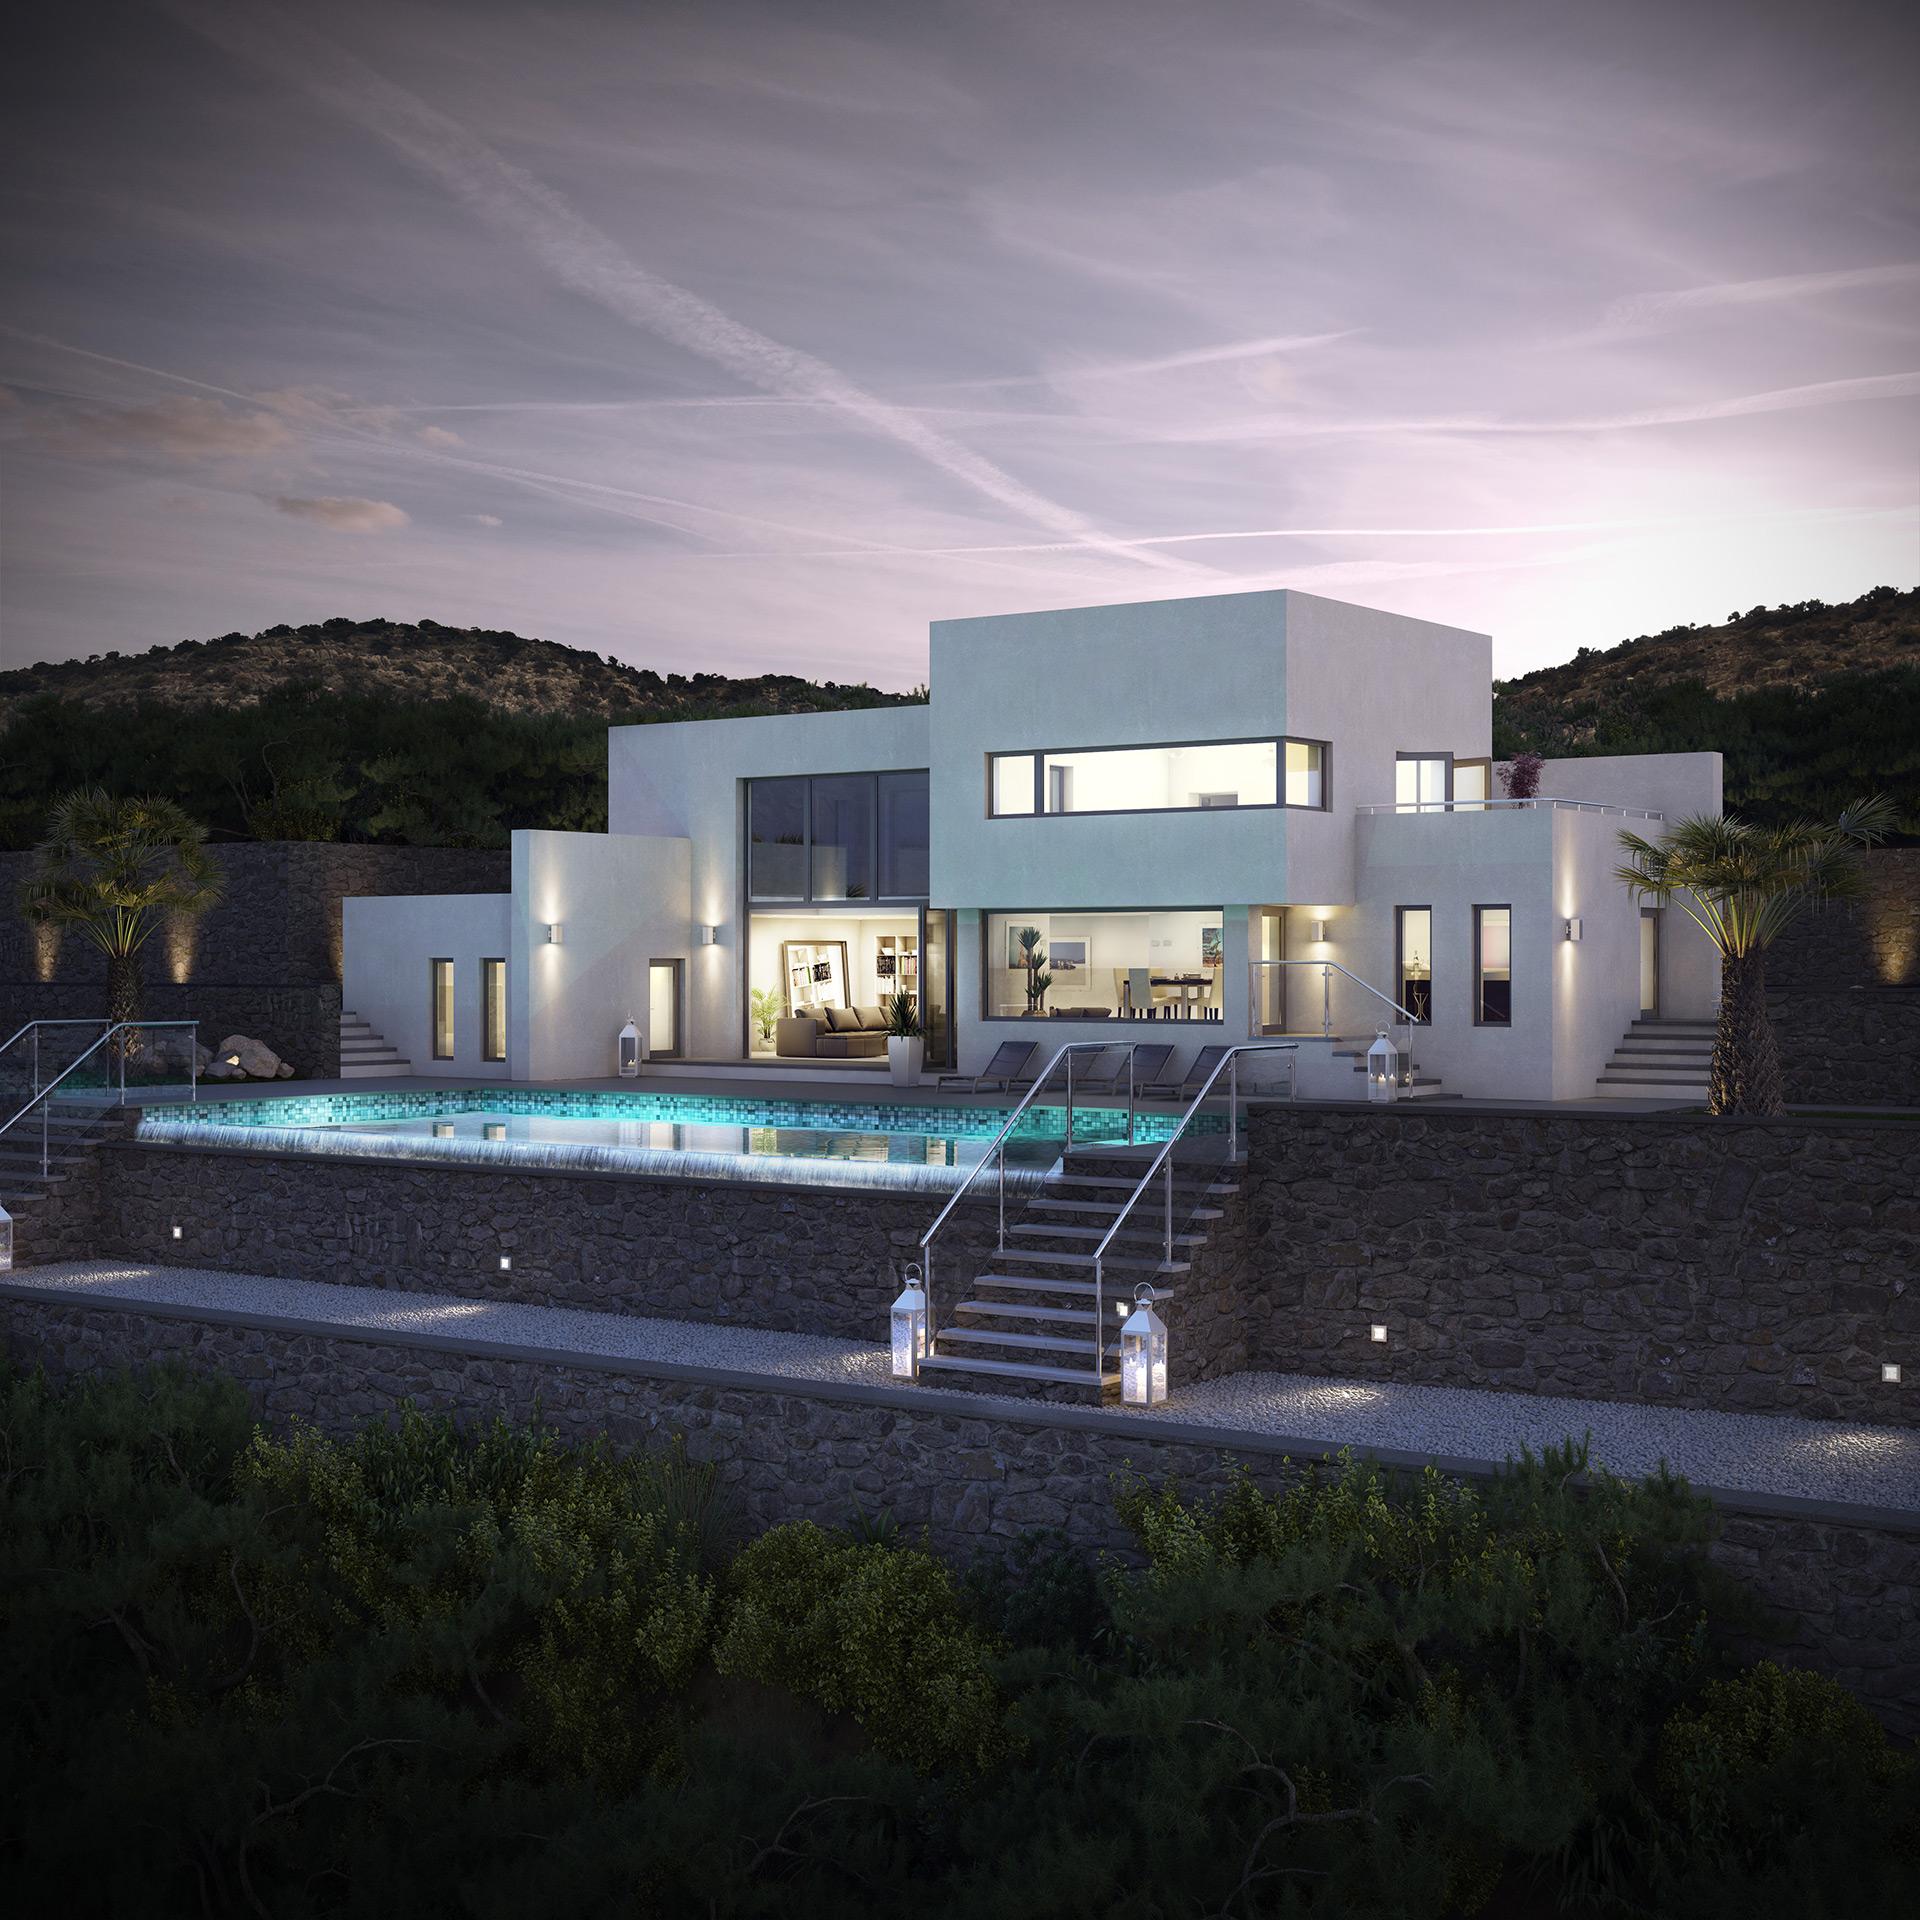 villa property and warm climates